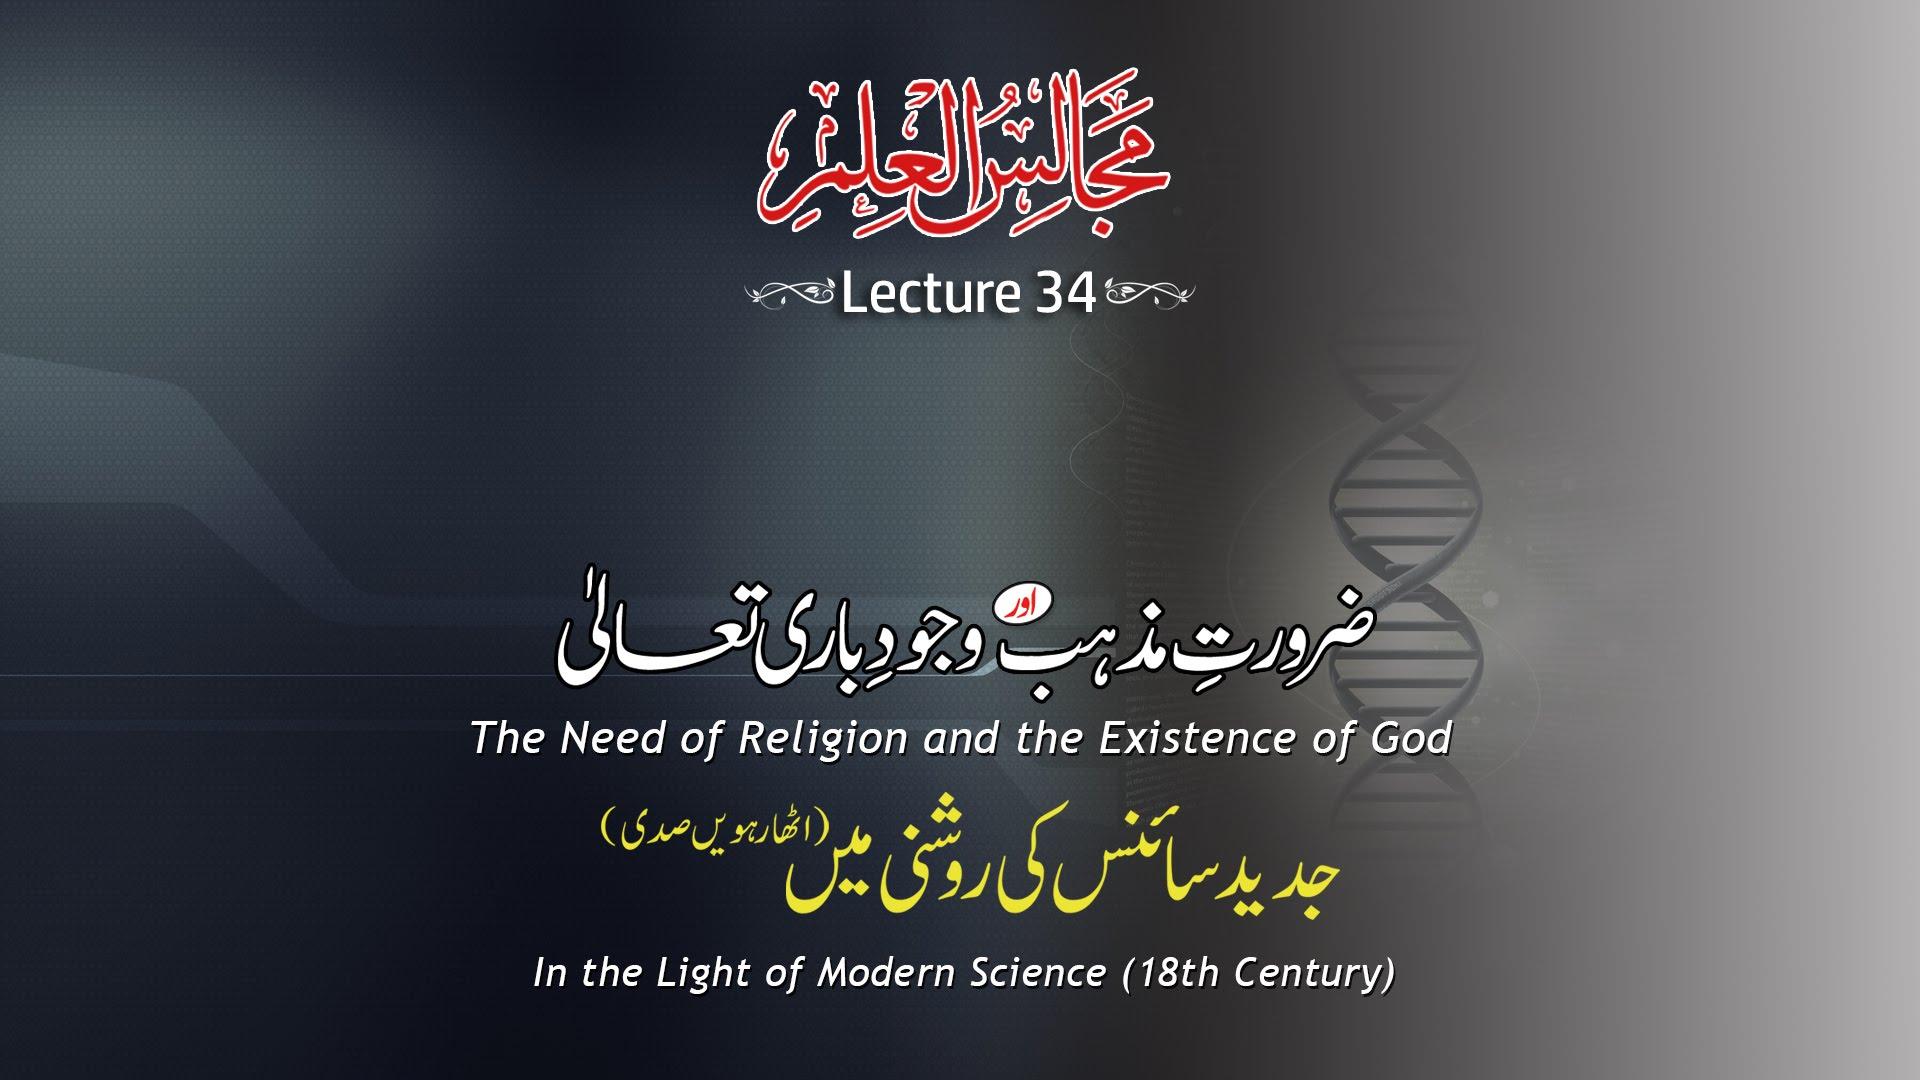 Majalis-ul-ilm (Lecture 34) - by Shaykh-ul-Islam Dr Muhammad Tahir-ul-Qadri